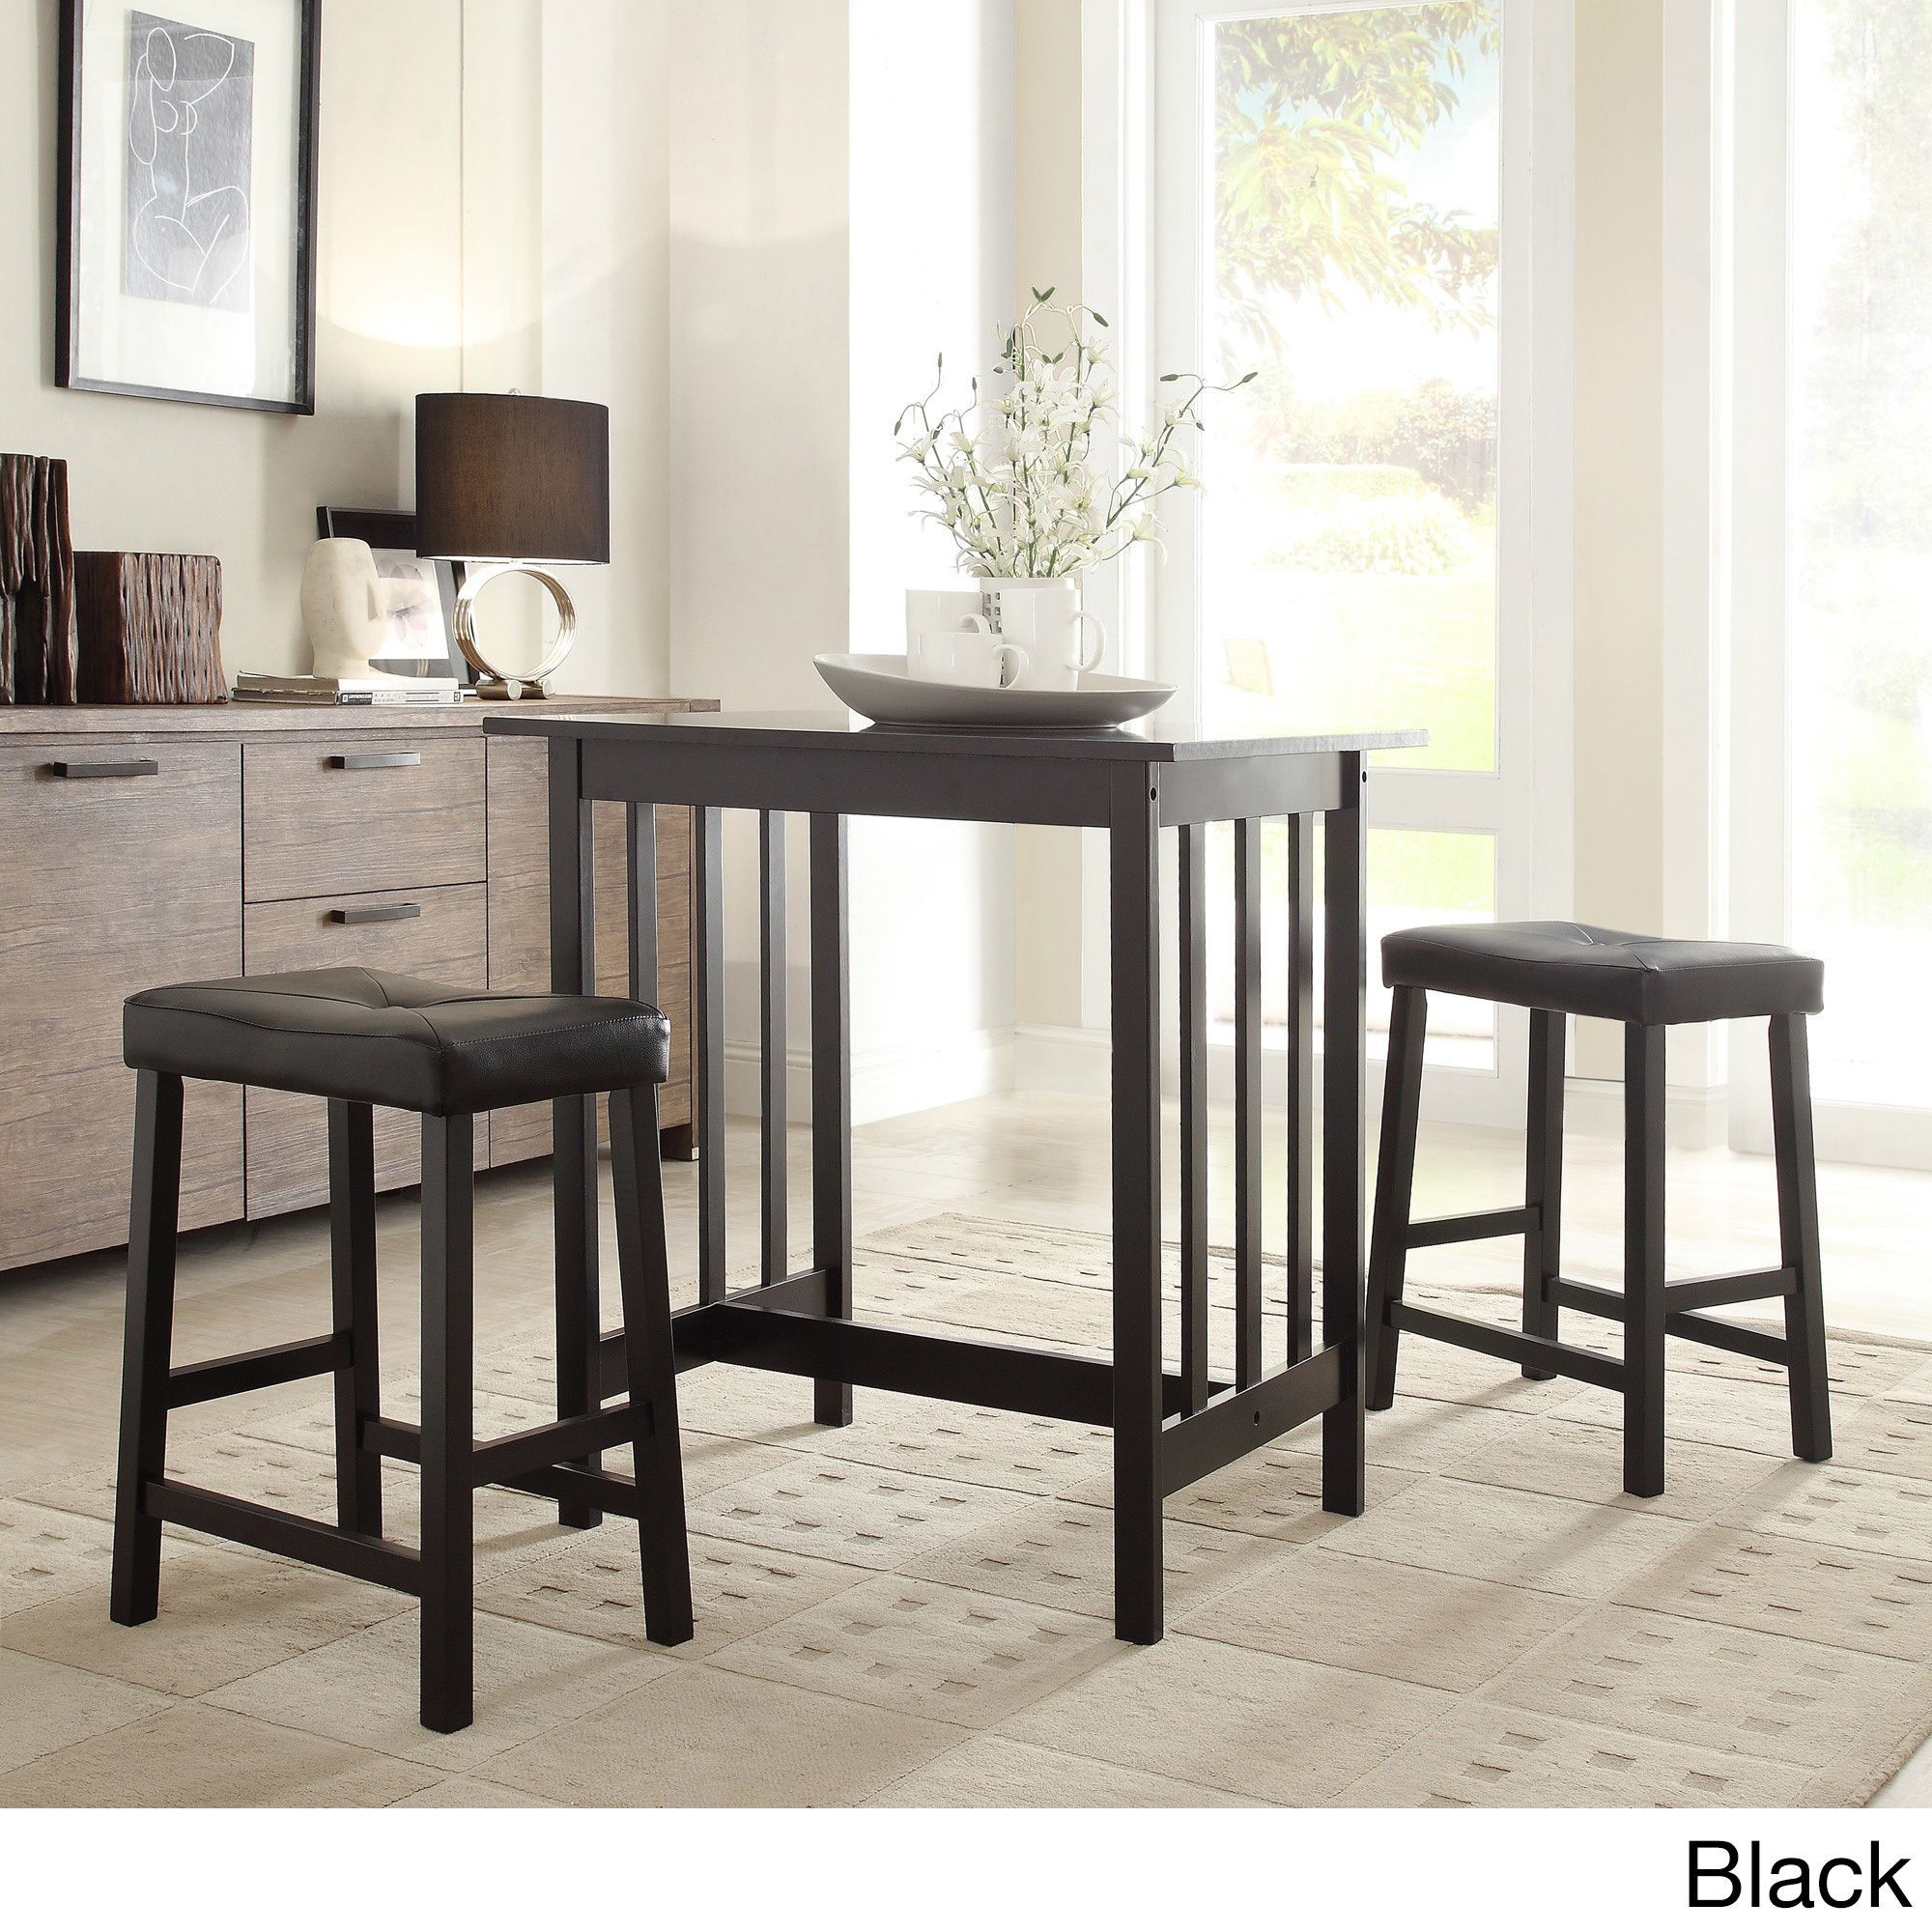 Tribecca Home Nova 3 Piece Kitchen Counter Height Dinette Set  23e1cc5106ca3e371caecf4f05bfbbee 551268810622366112. Three Piece Kitchen  Sets